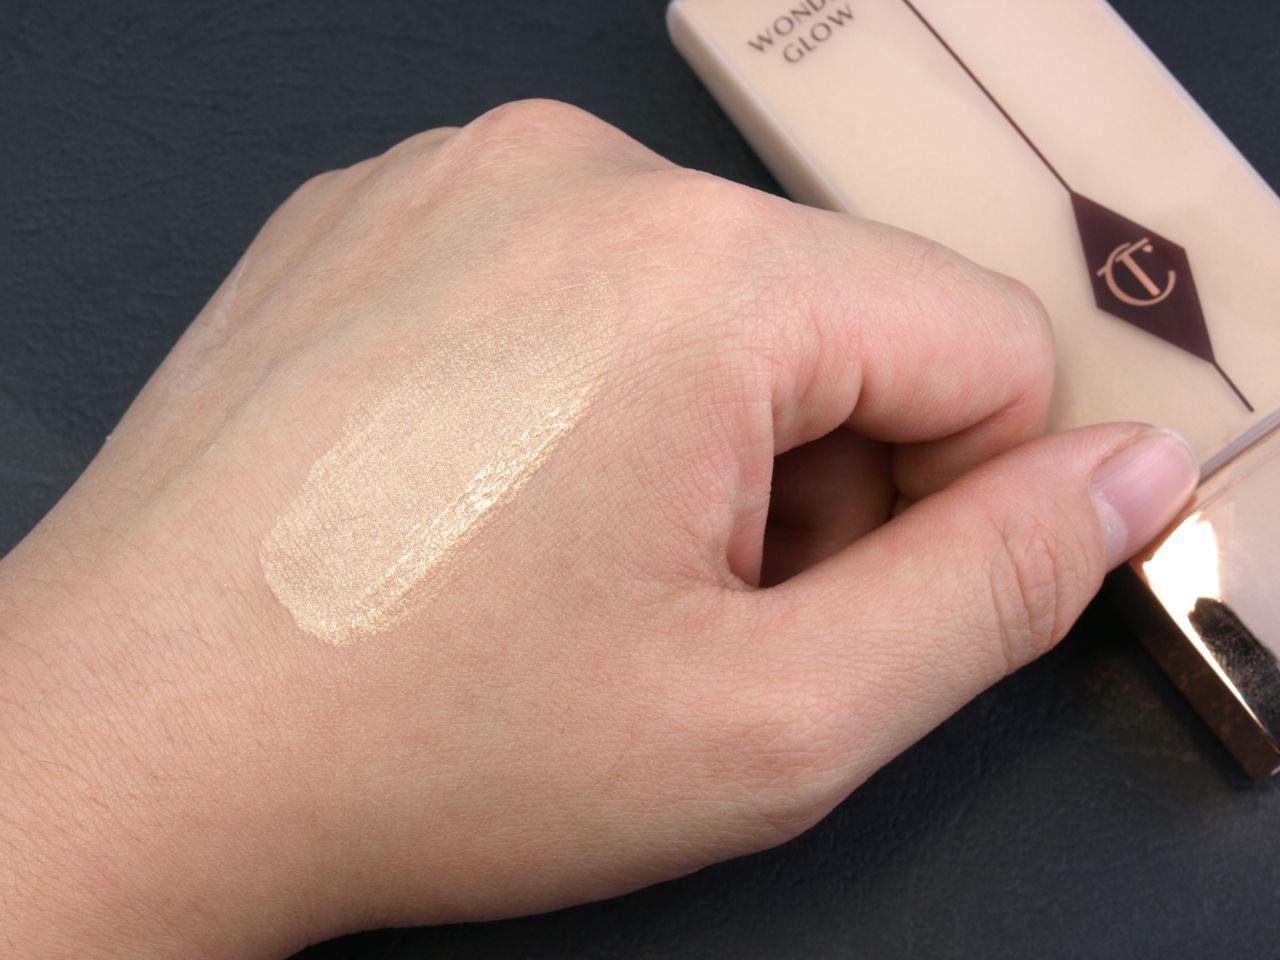 60fe0f12cc48 Charlotte Tilbury Wonder Glow Instant Soft-Focus Beauty Flash Primer ...